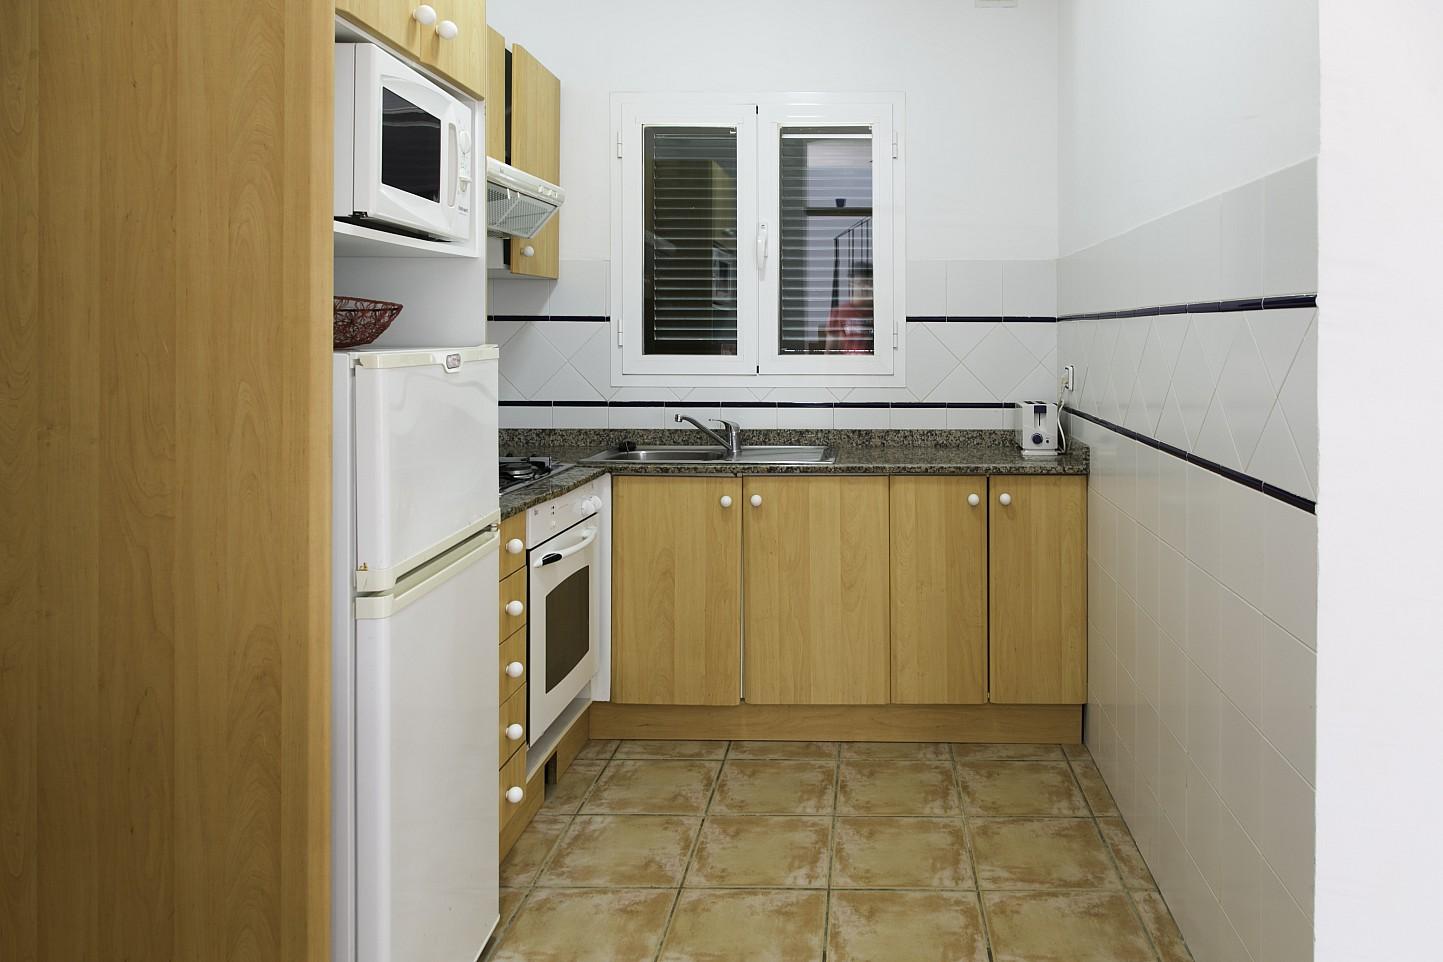 Cocina de bonita casa en venta en Urb. Villas de Cala Romántica en Mallorca